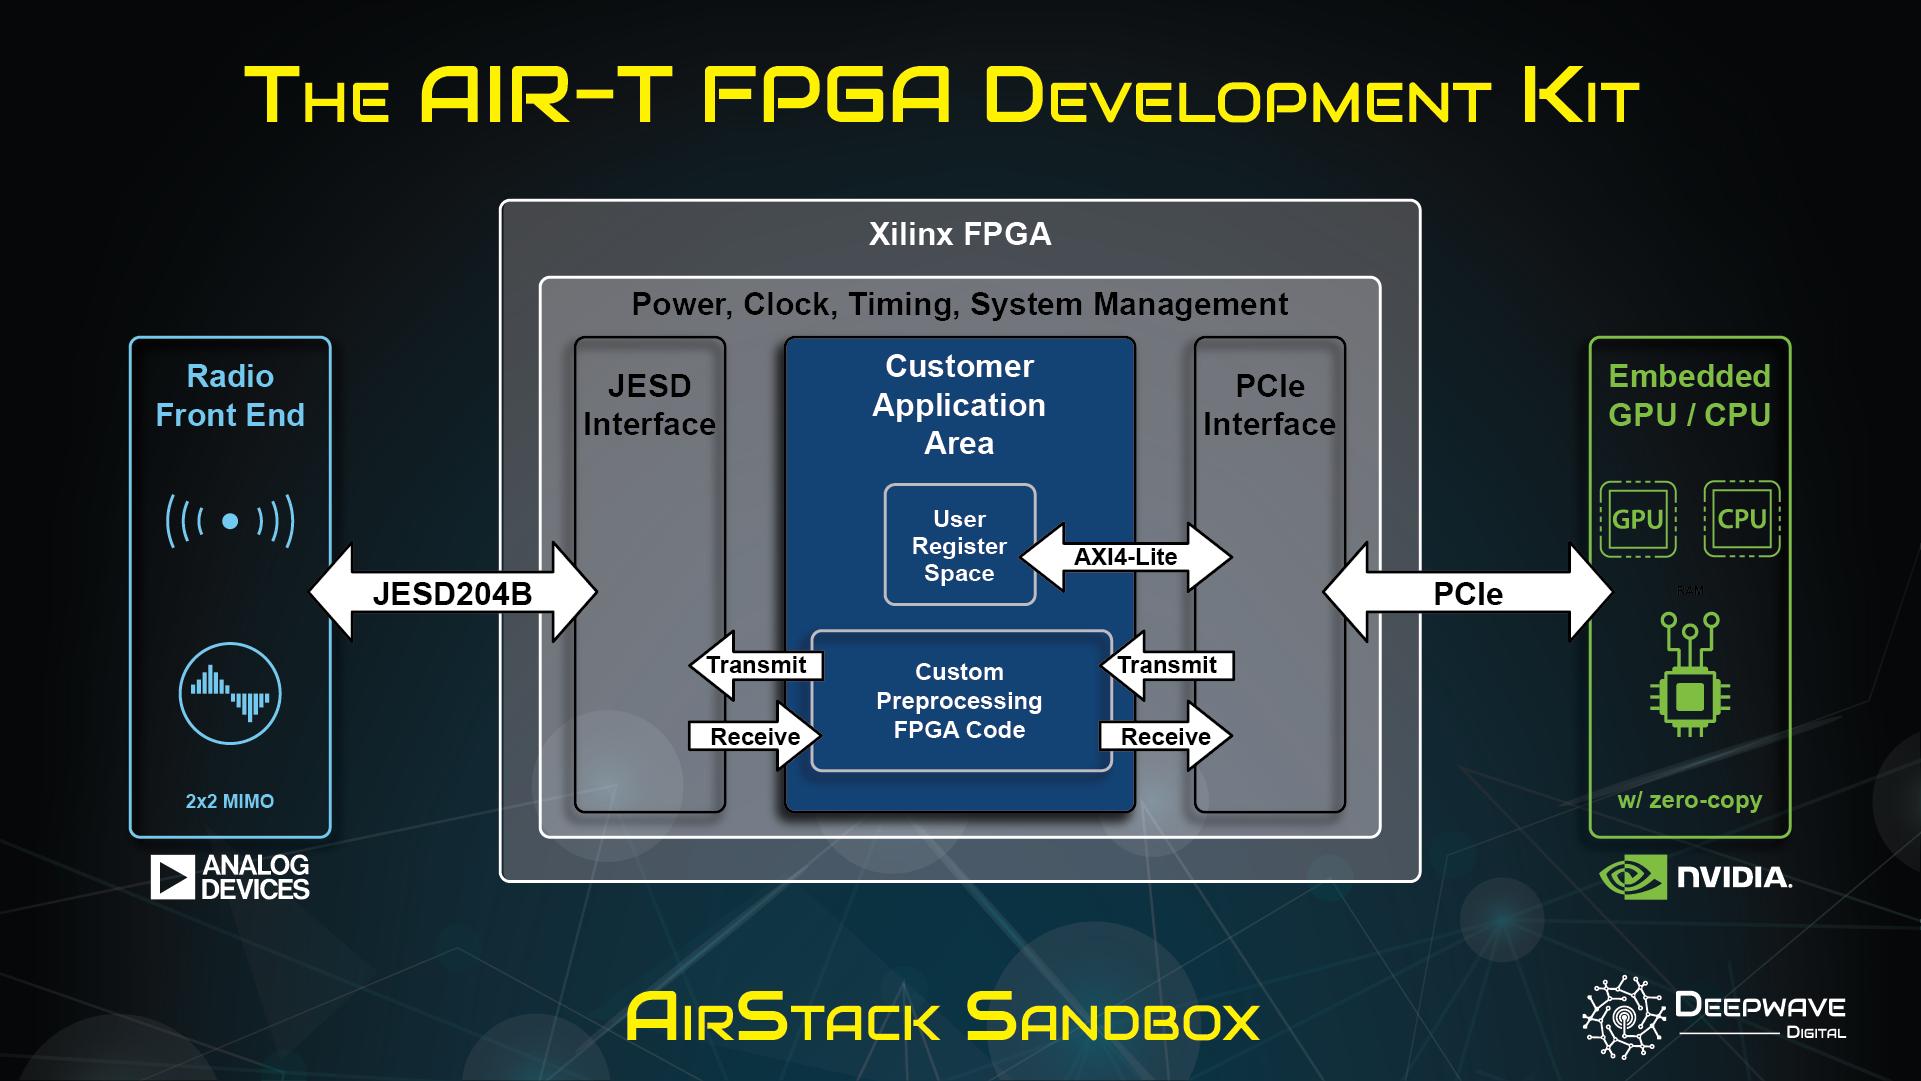 AirStack Sandbox An FPGA Development Kit for the AIR-T